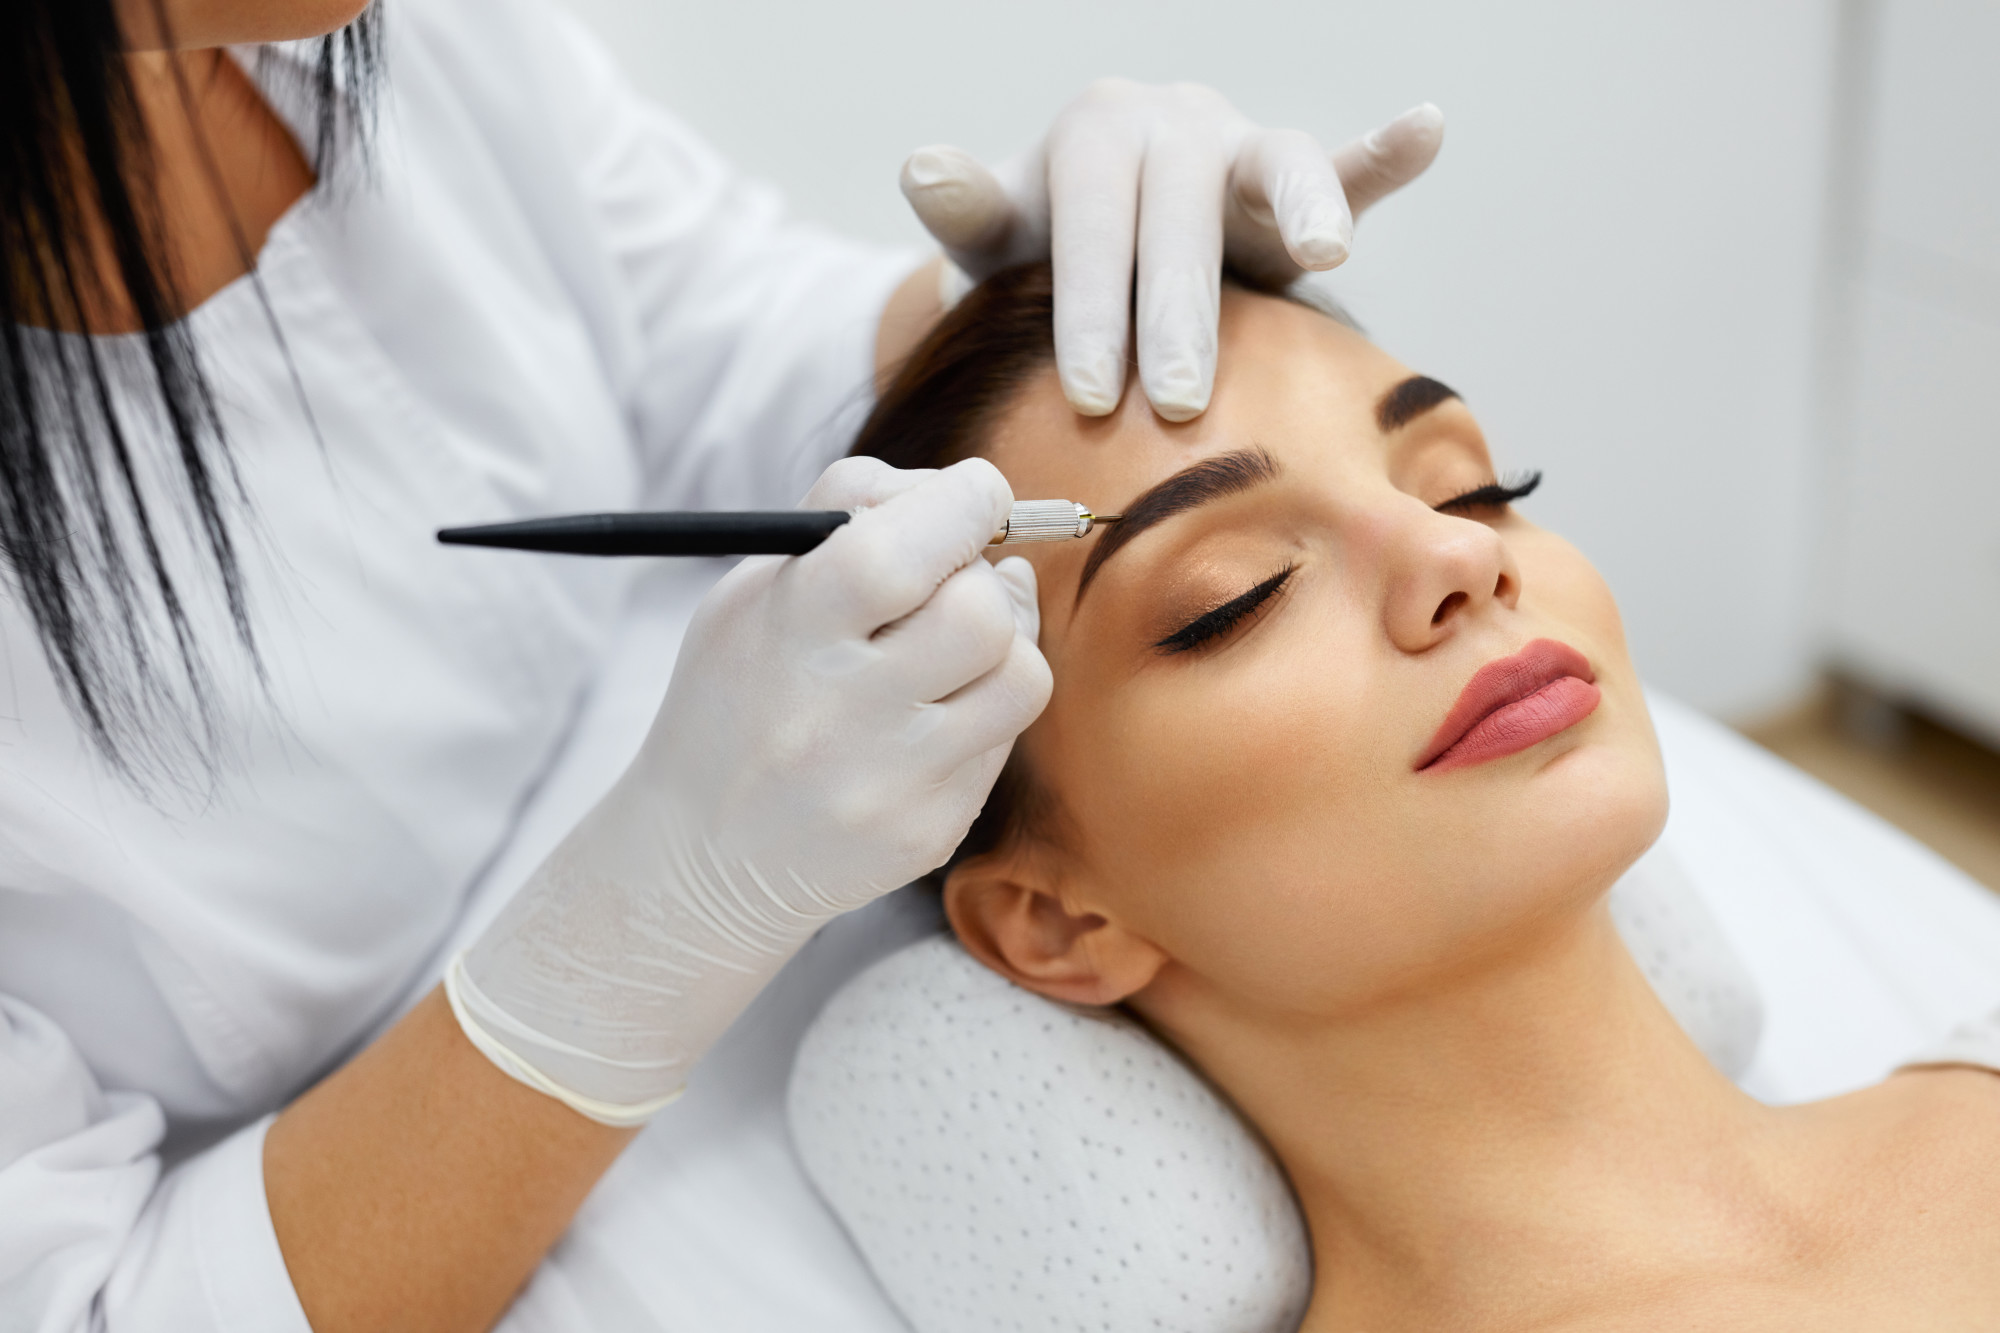 3 Ways to Improve Your Eyebrow Shape